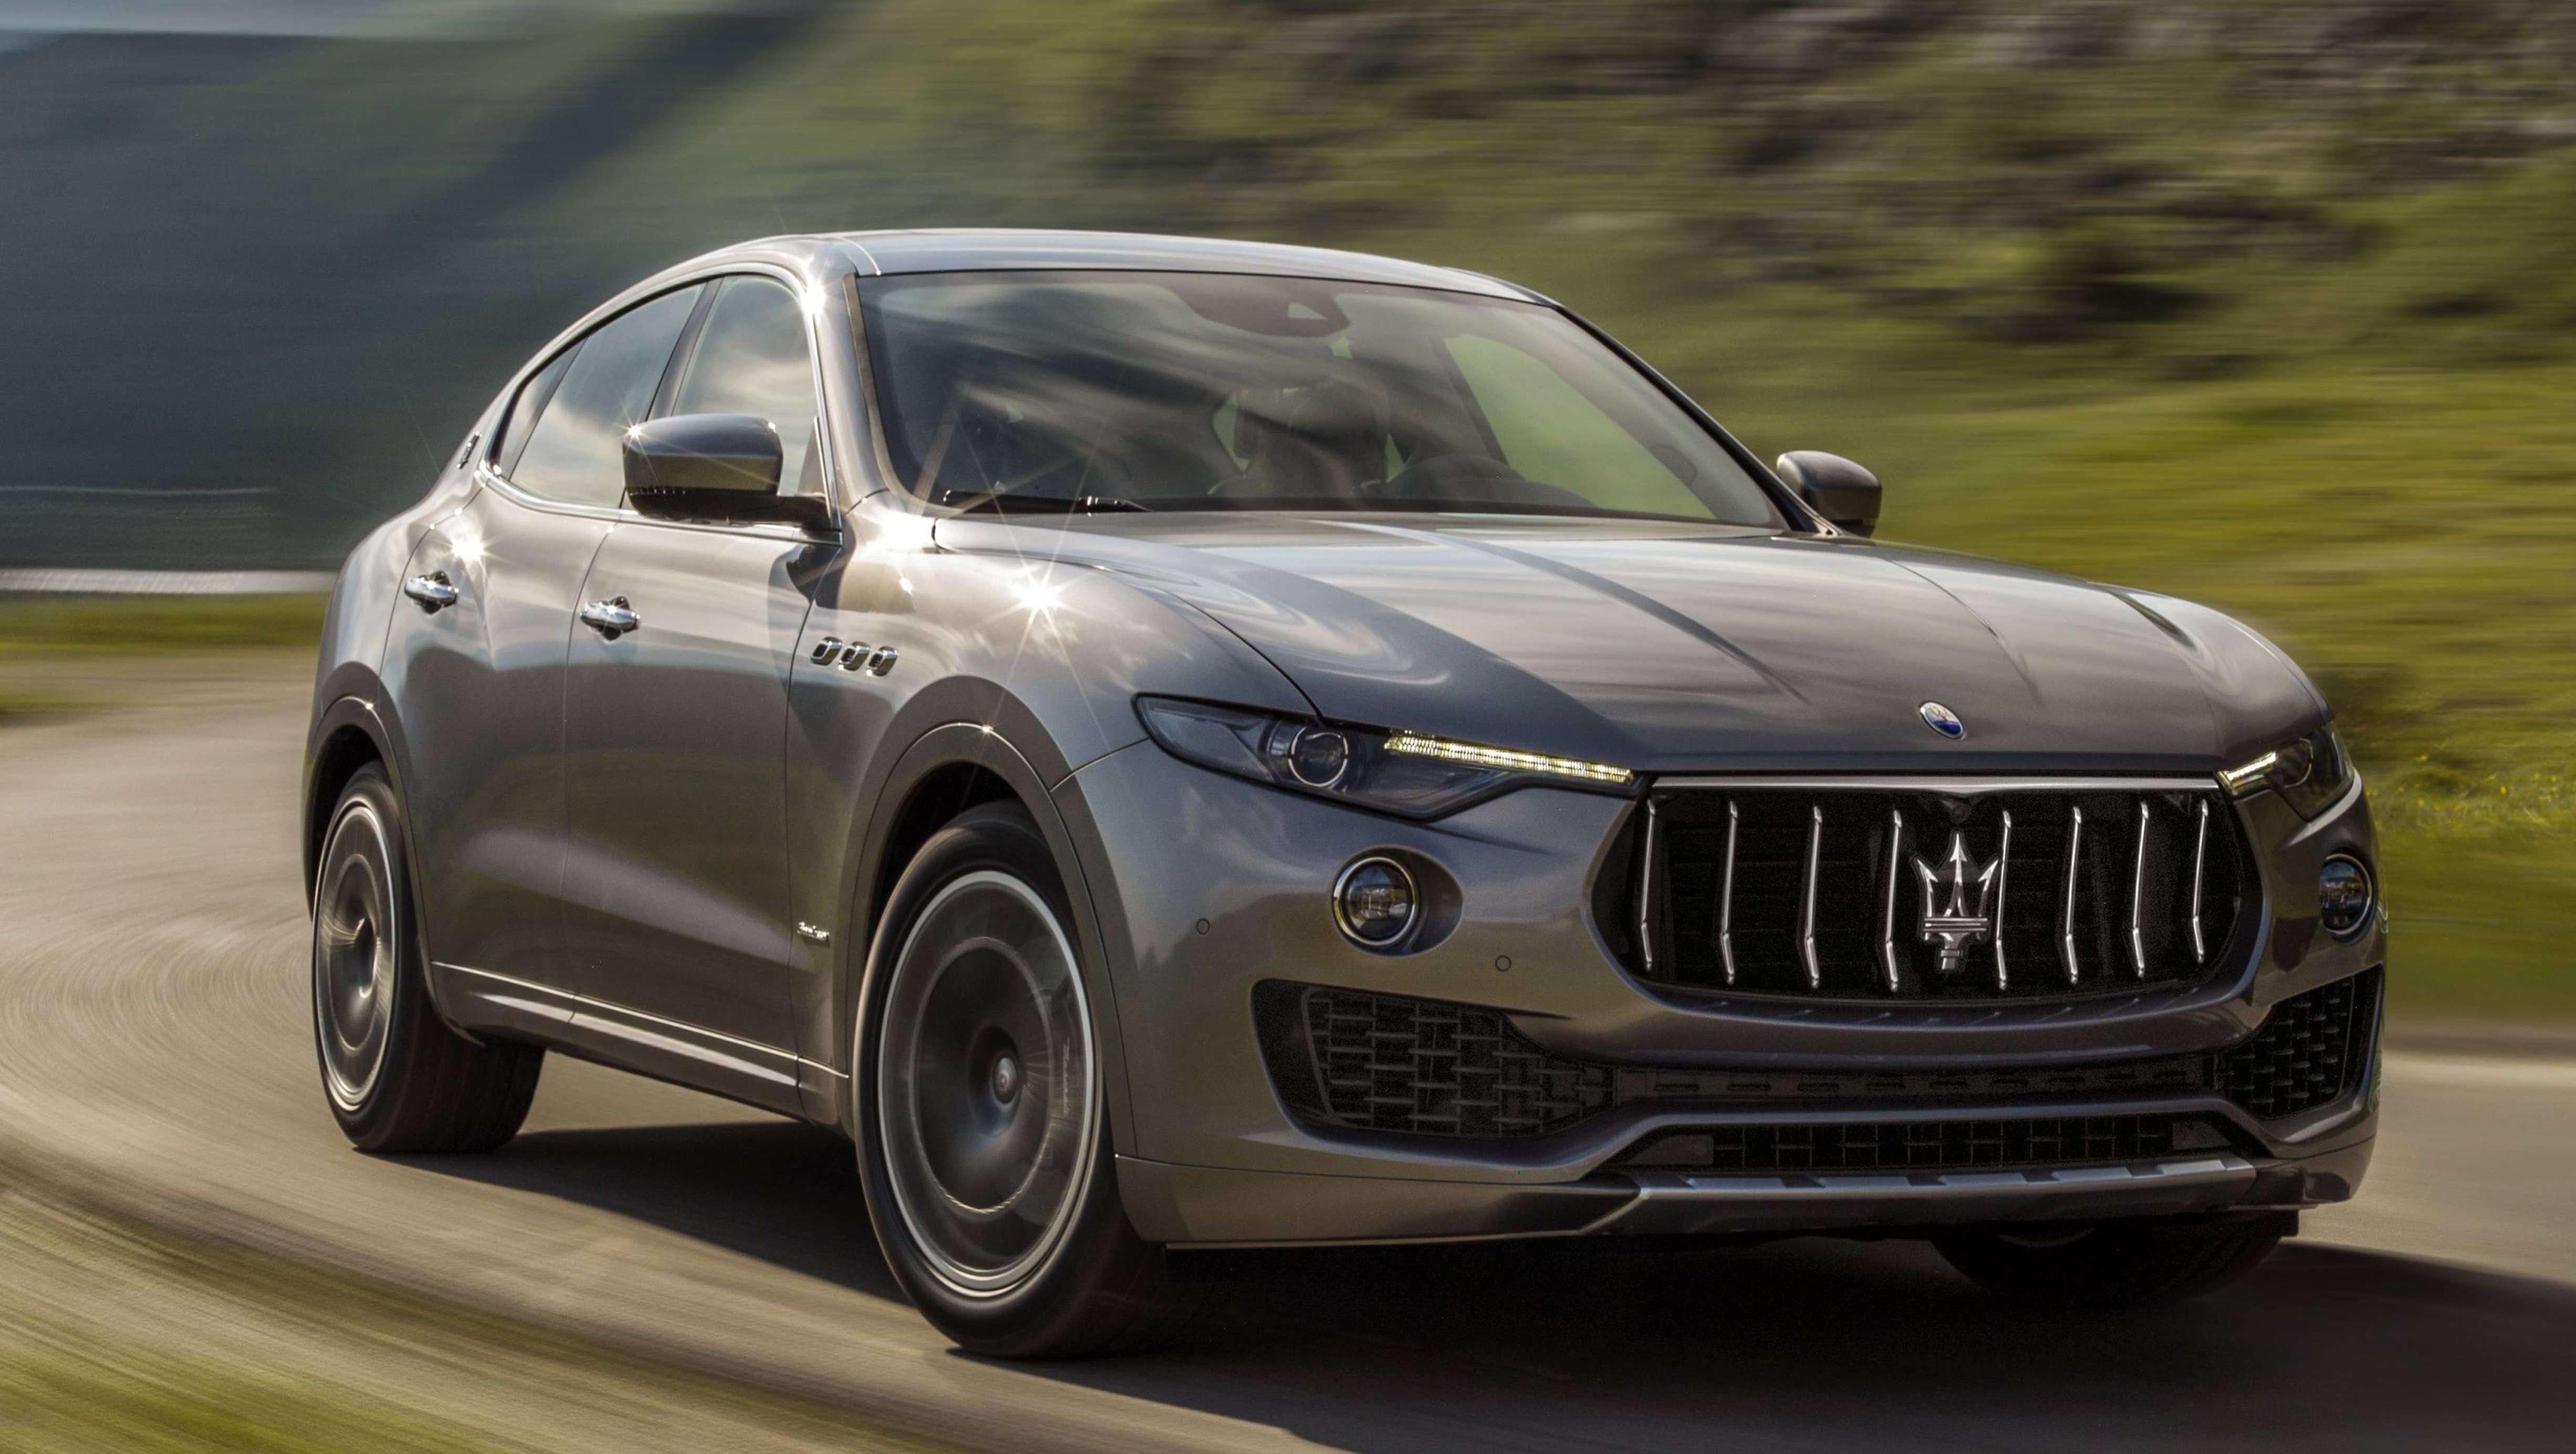 Maserati Levante Super Luxury Sports Car Market To Grow At 23 Cagr In Next 5 Years Maserati India Auto News Et Auto